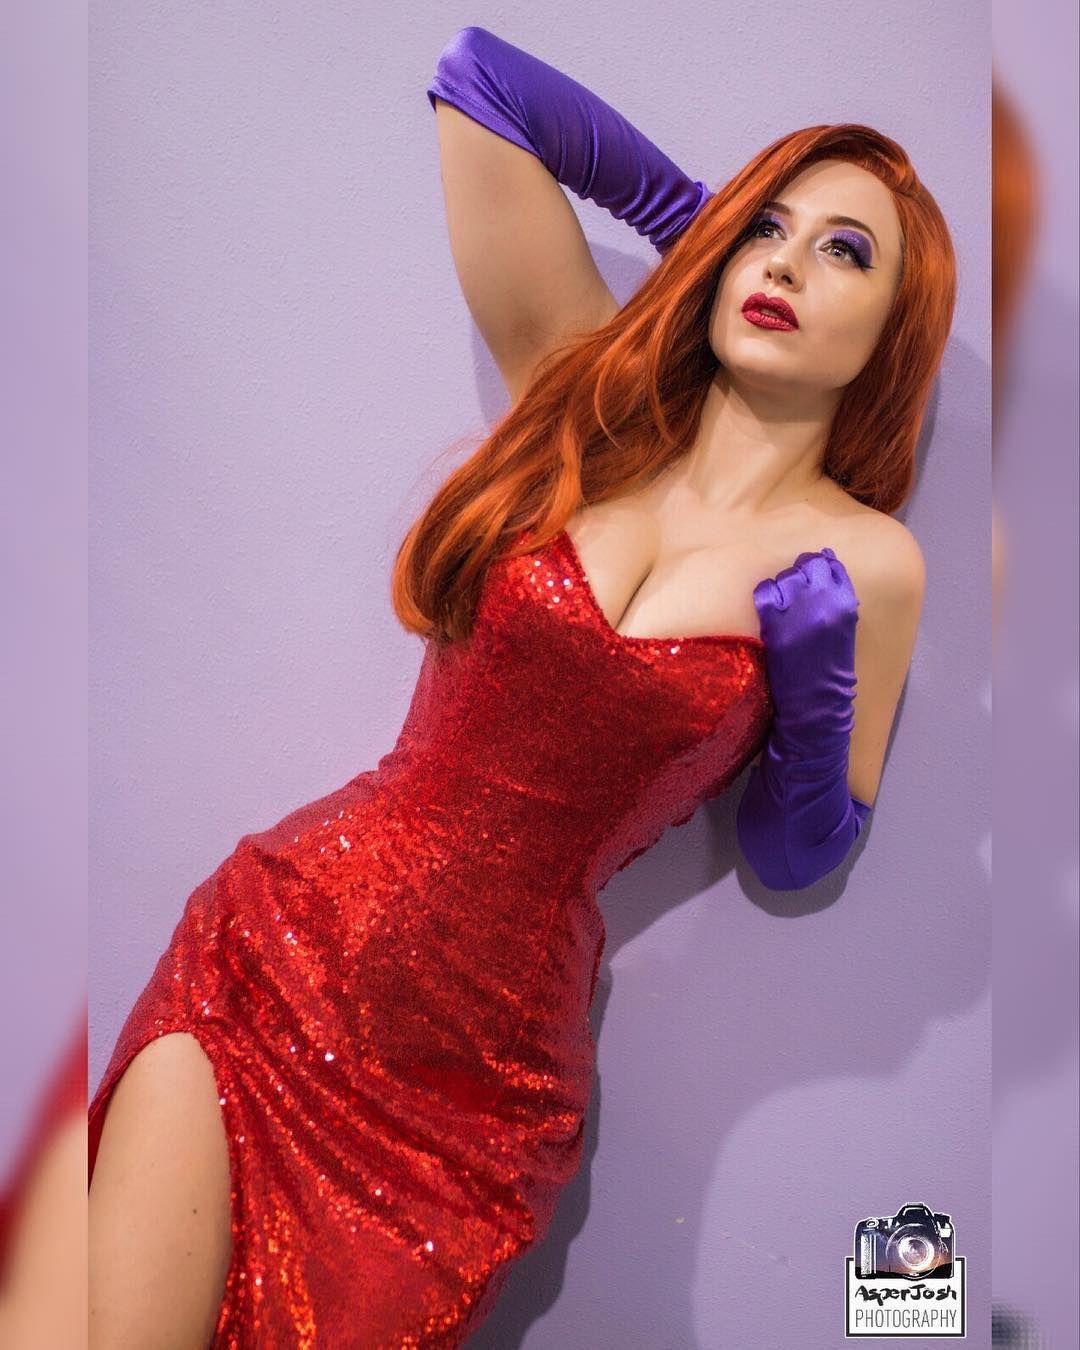 Jessica Rabbit Cosplay by KatDiVine22 on DeviantArt